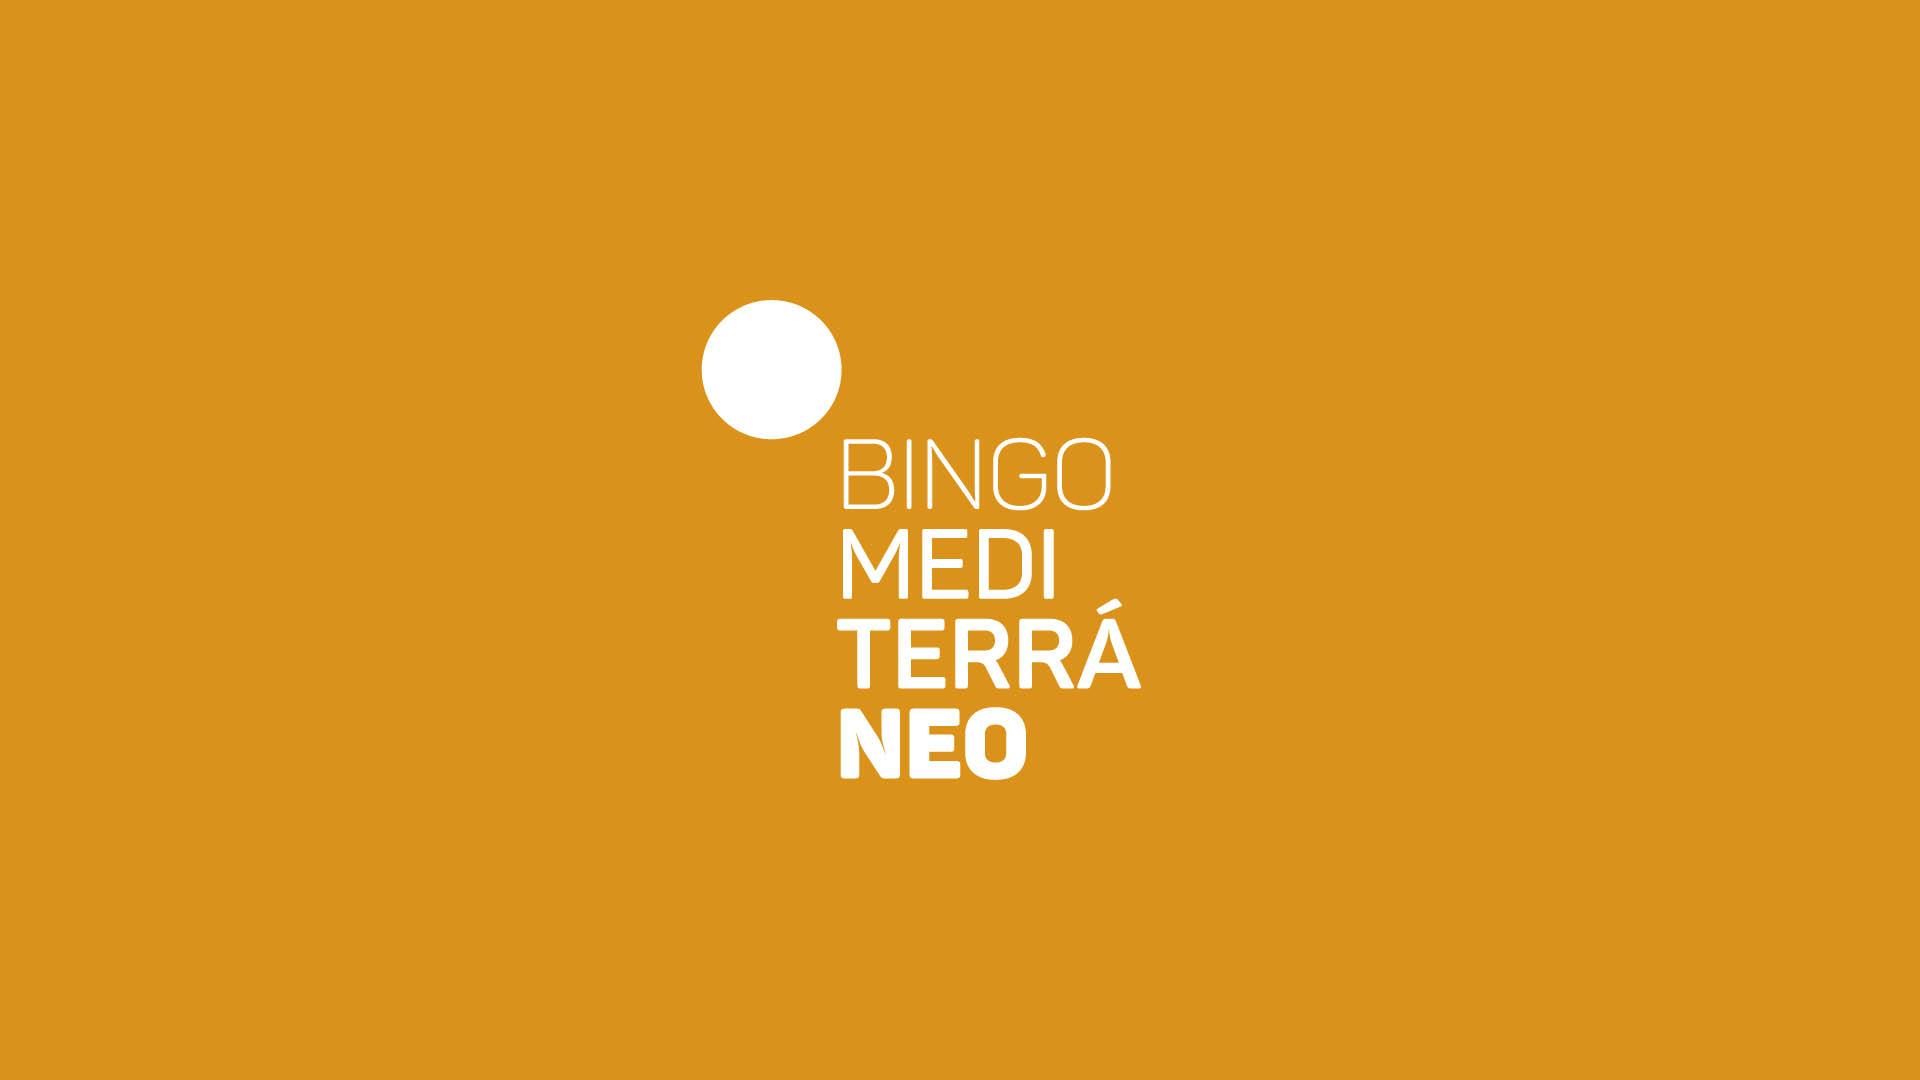 Bingo Mediterraneo